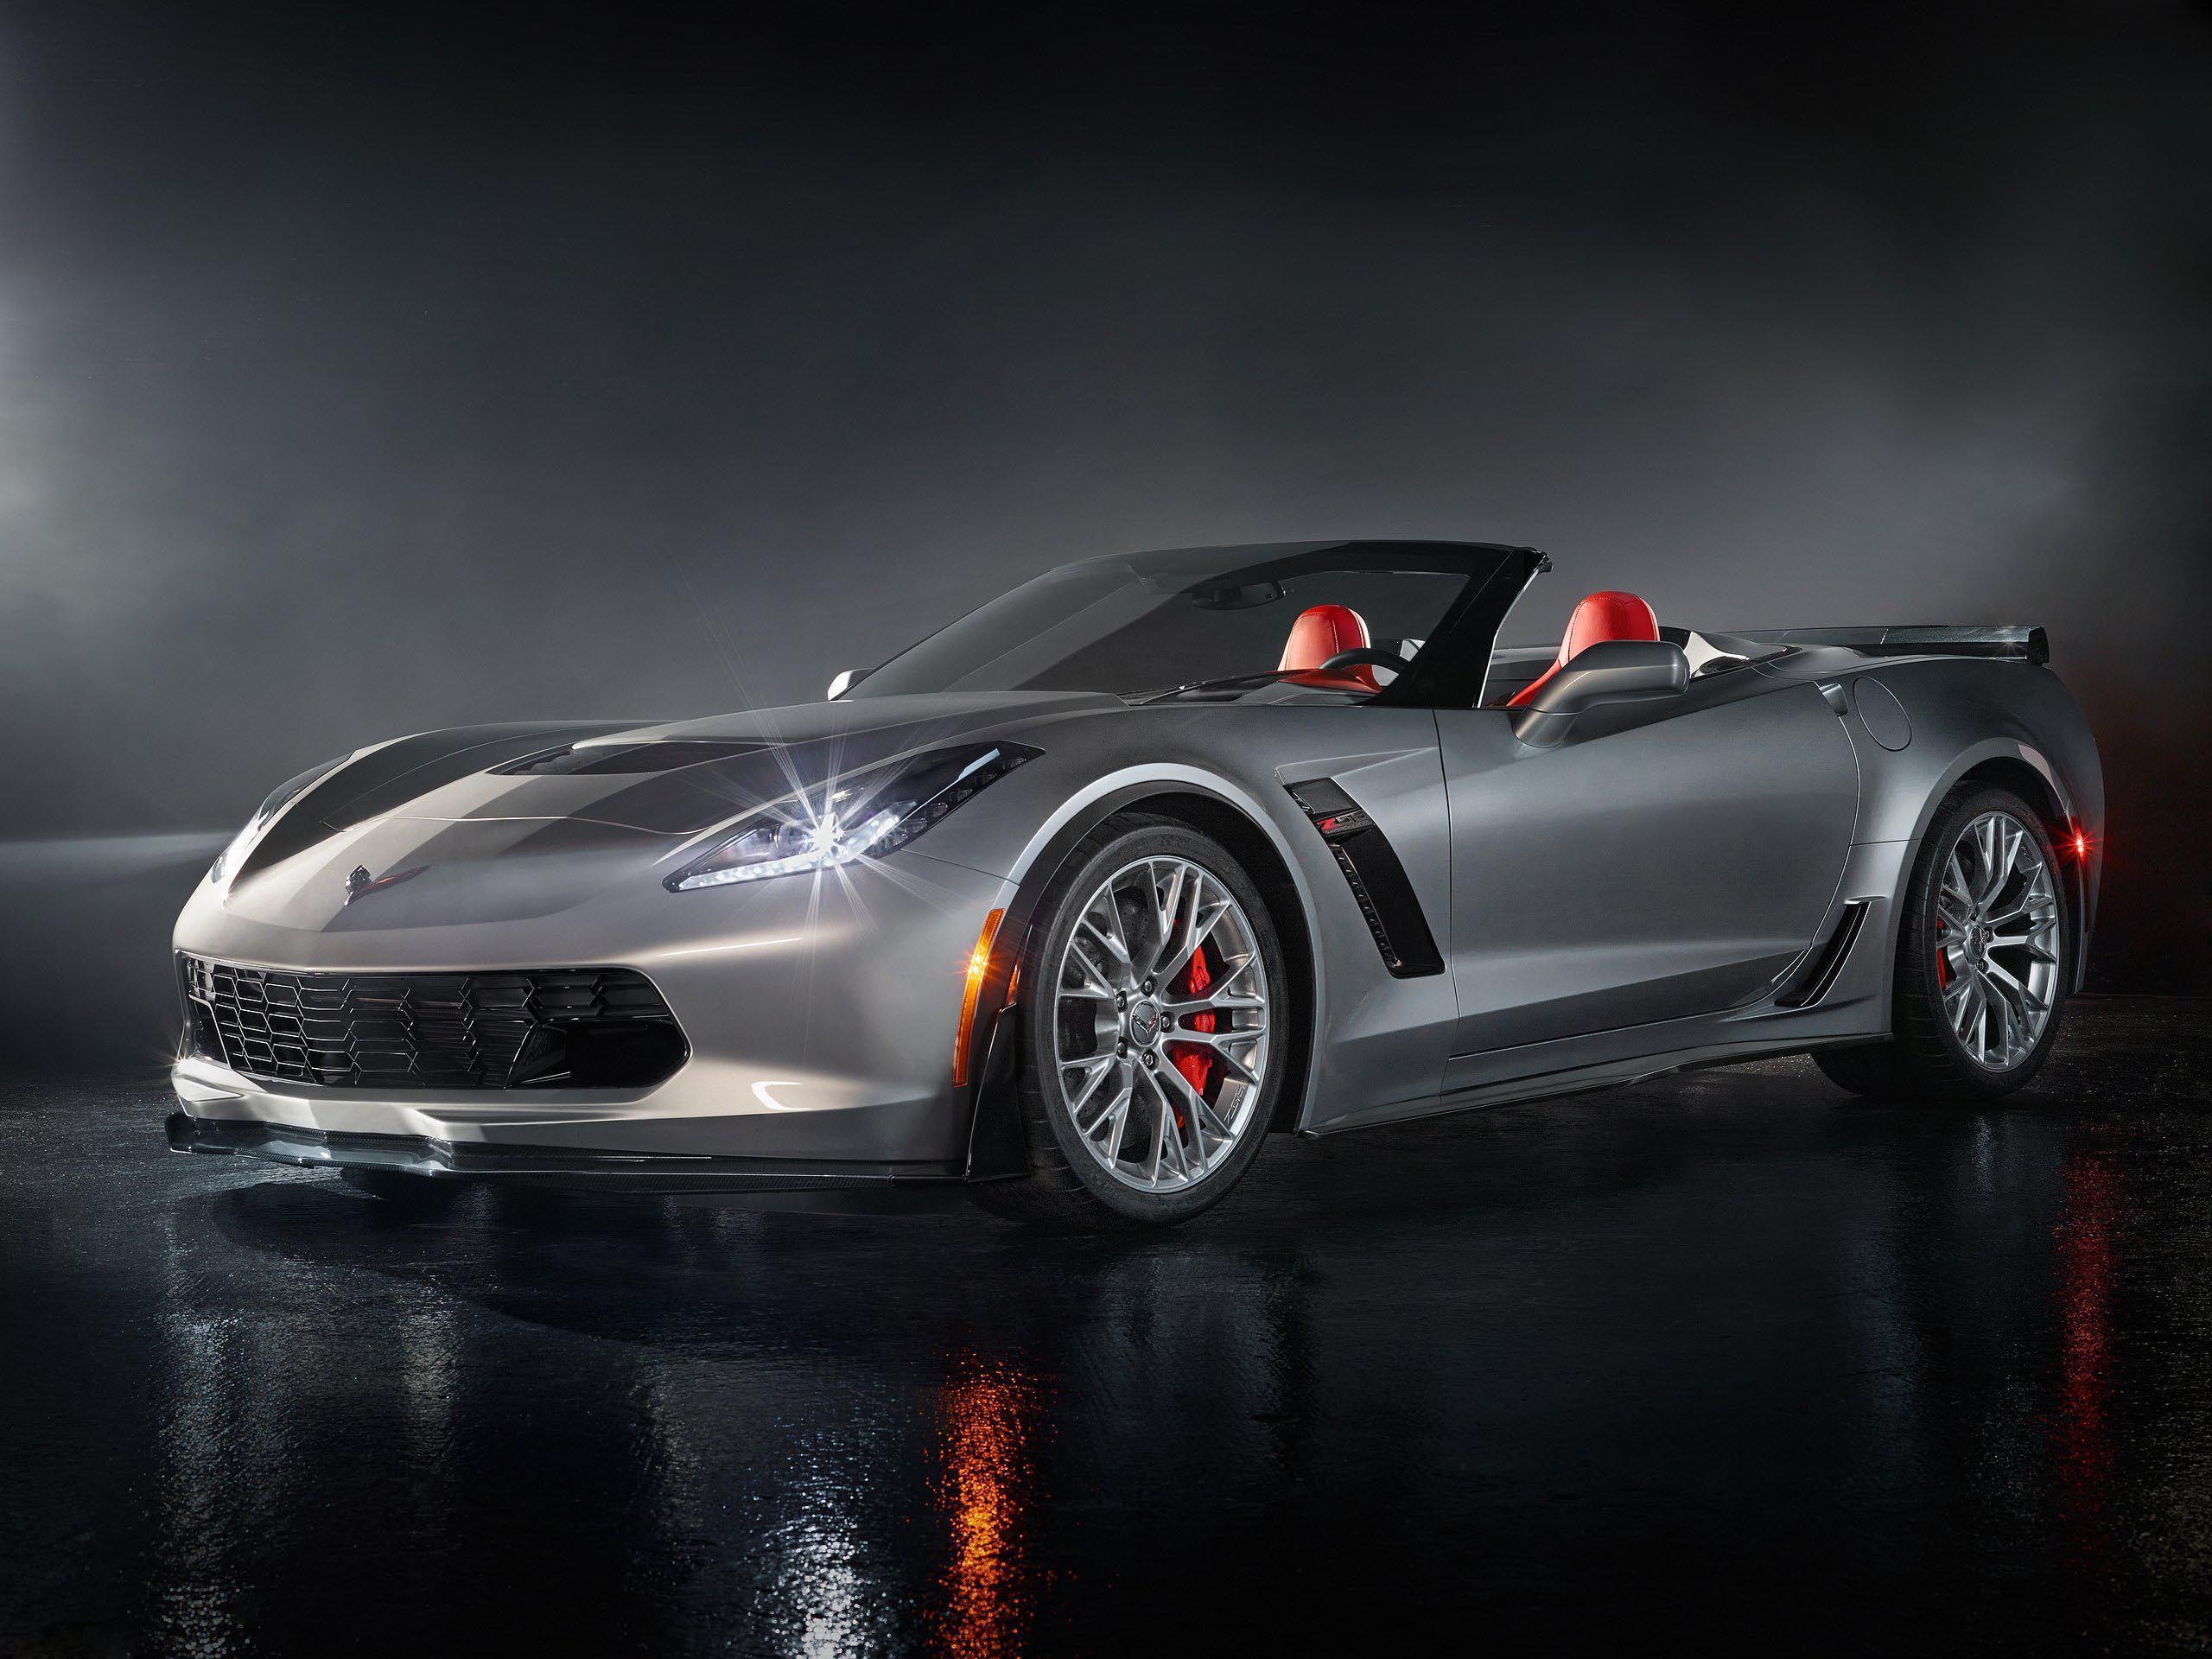 Corvette 2016 Wallpapers Hd Wallpaper Cave